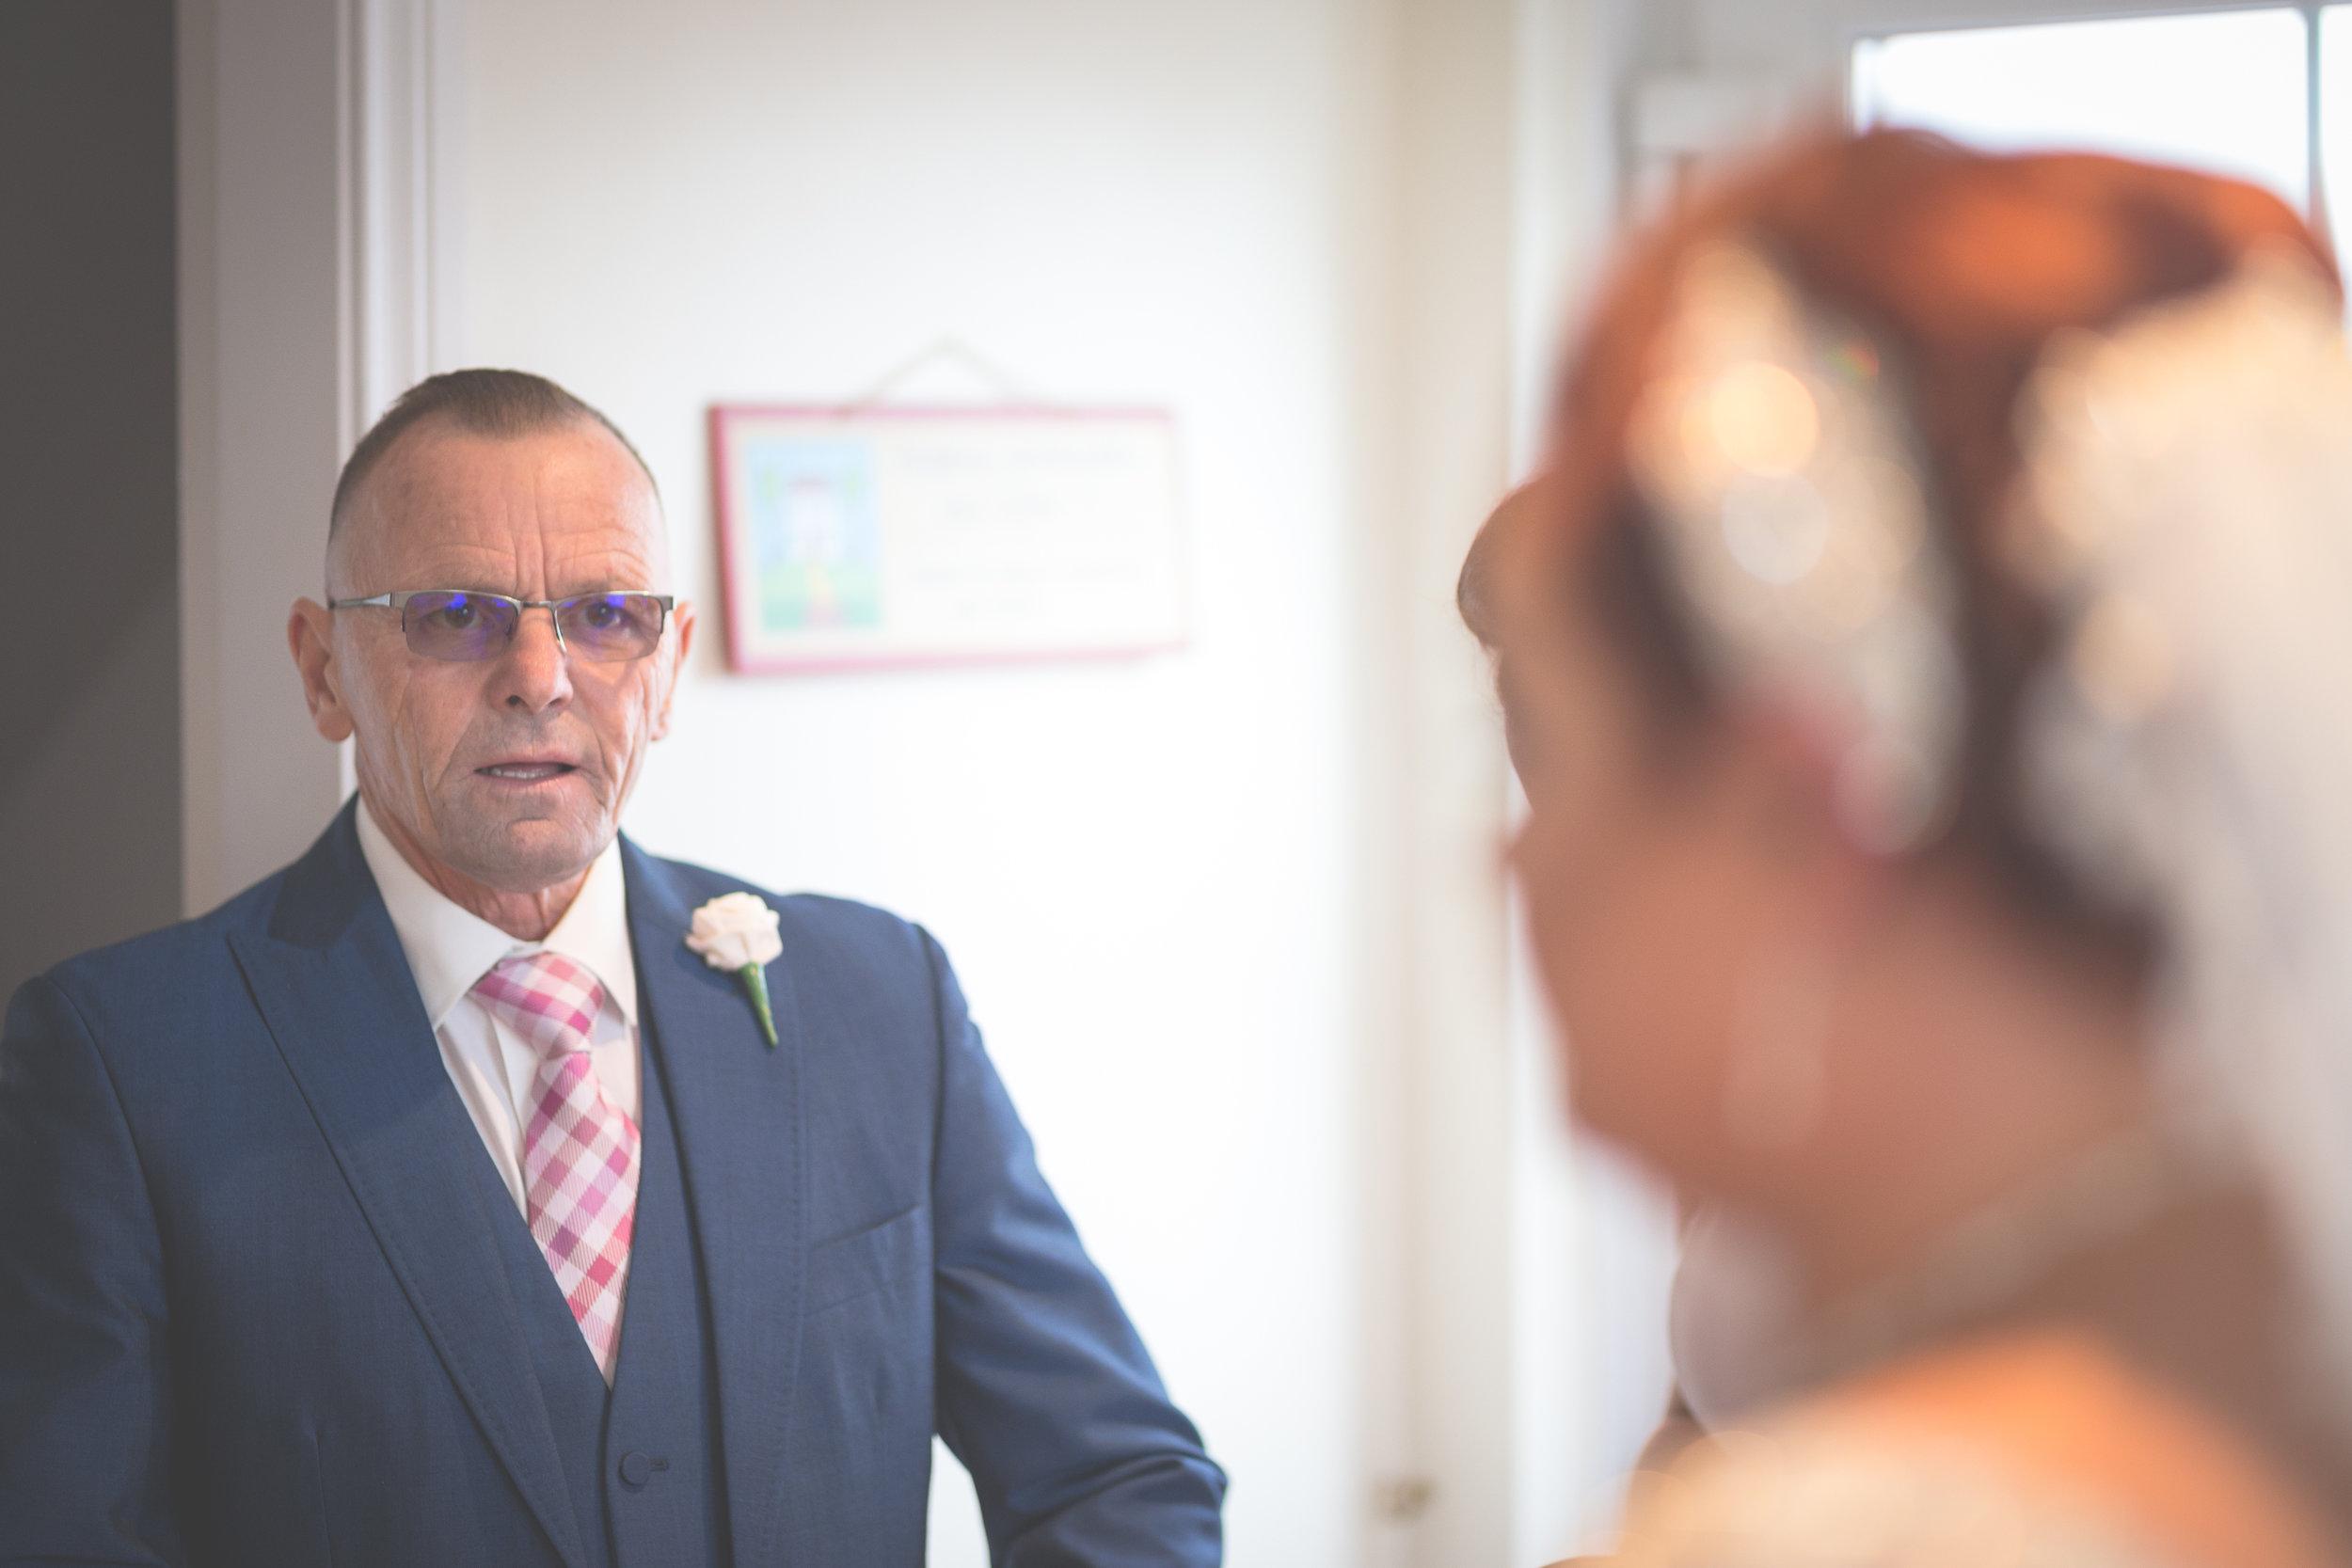 Antoinette & Stephen - Bridal Preparations | Brian McEwan Photography | Wedding Photographer Northern Ireland 187.jpg